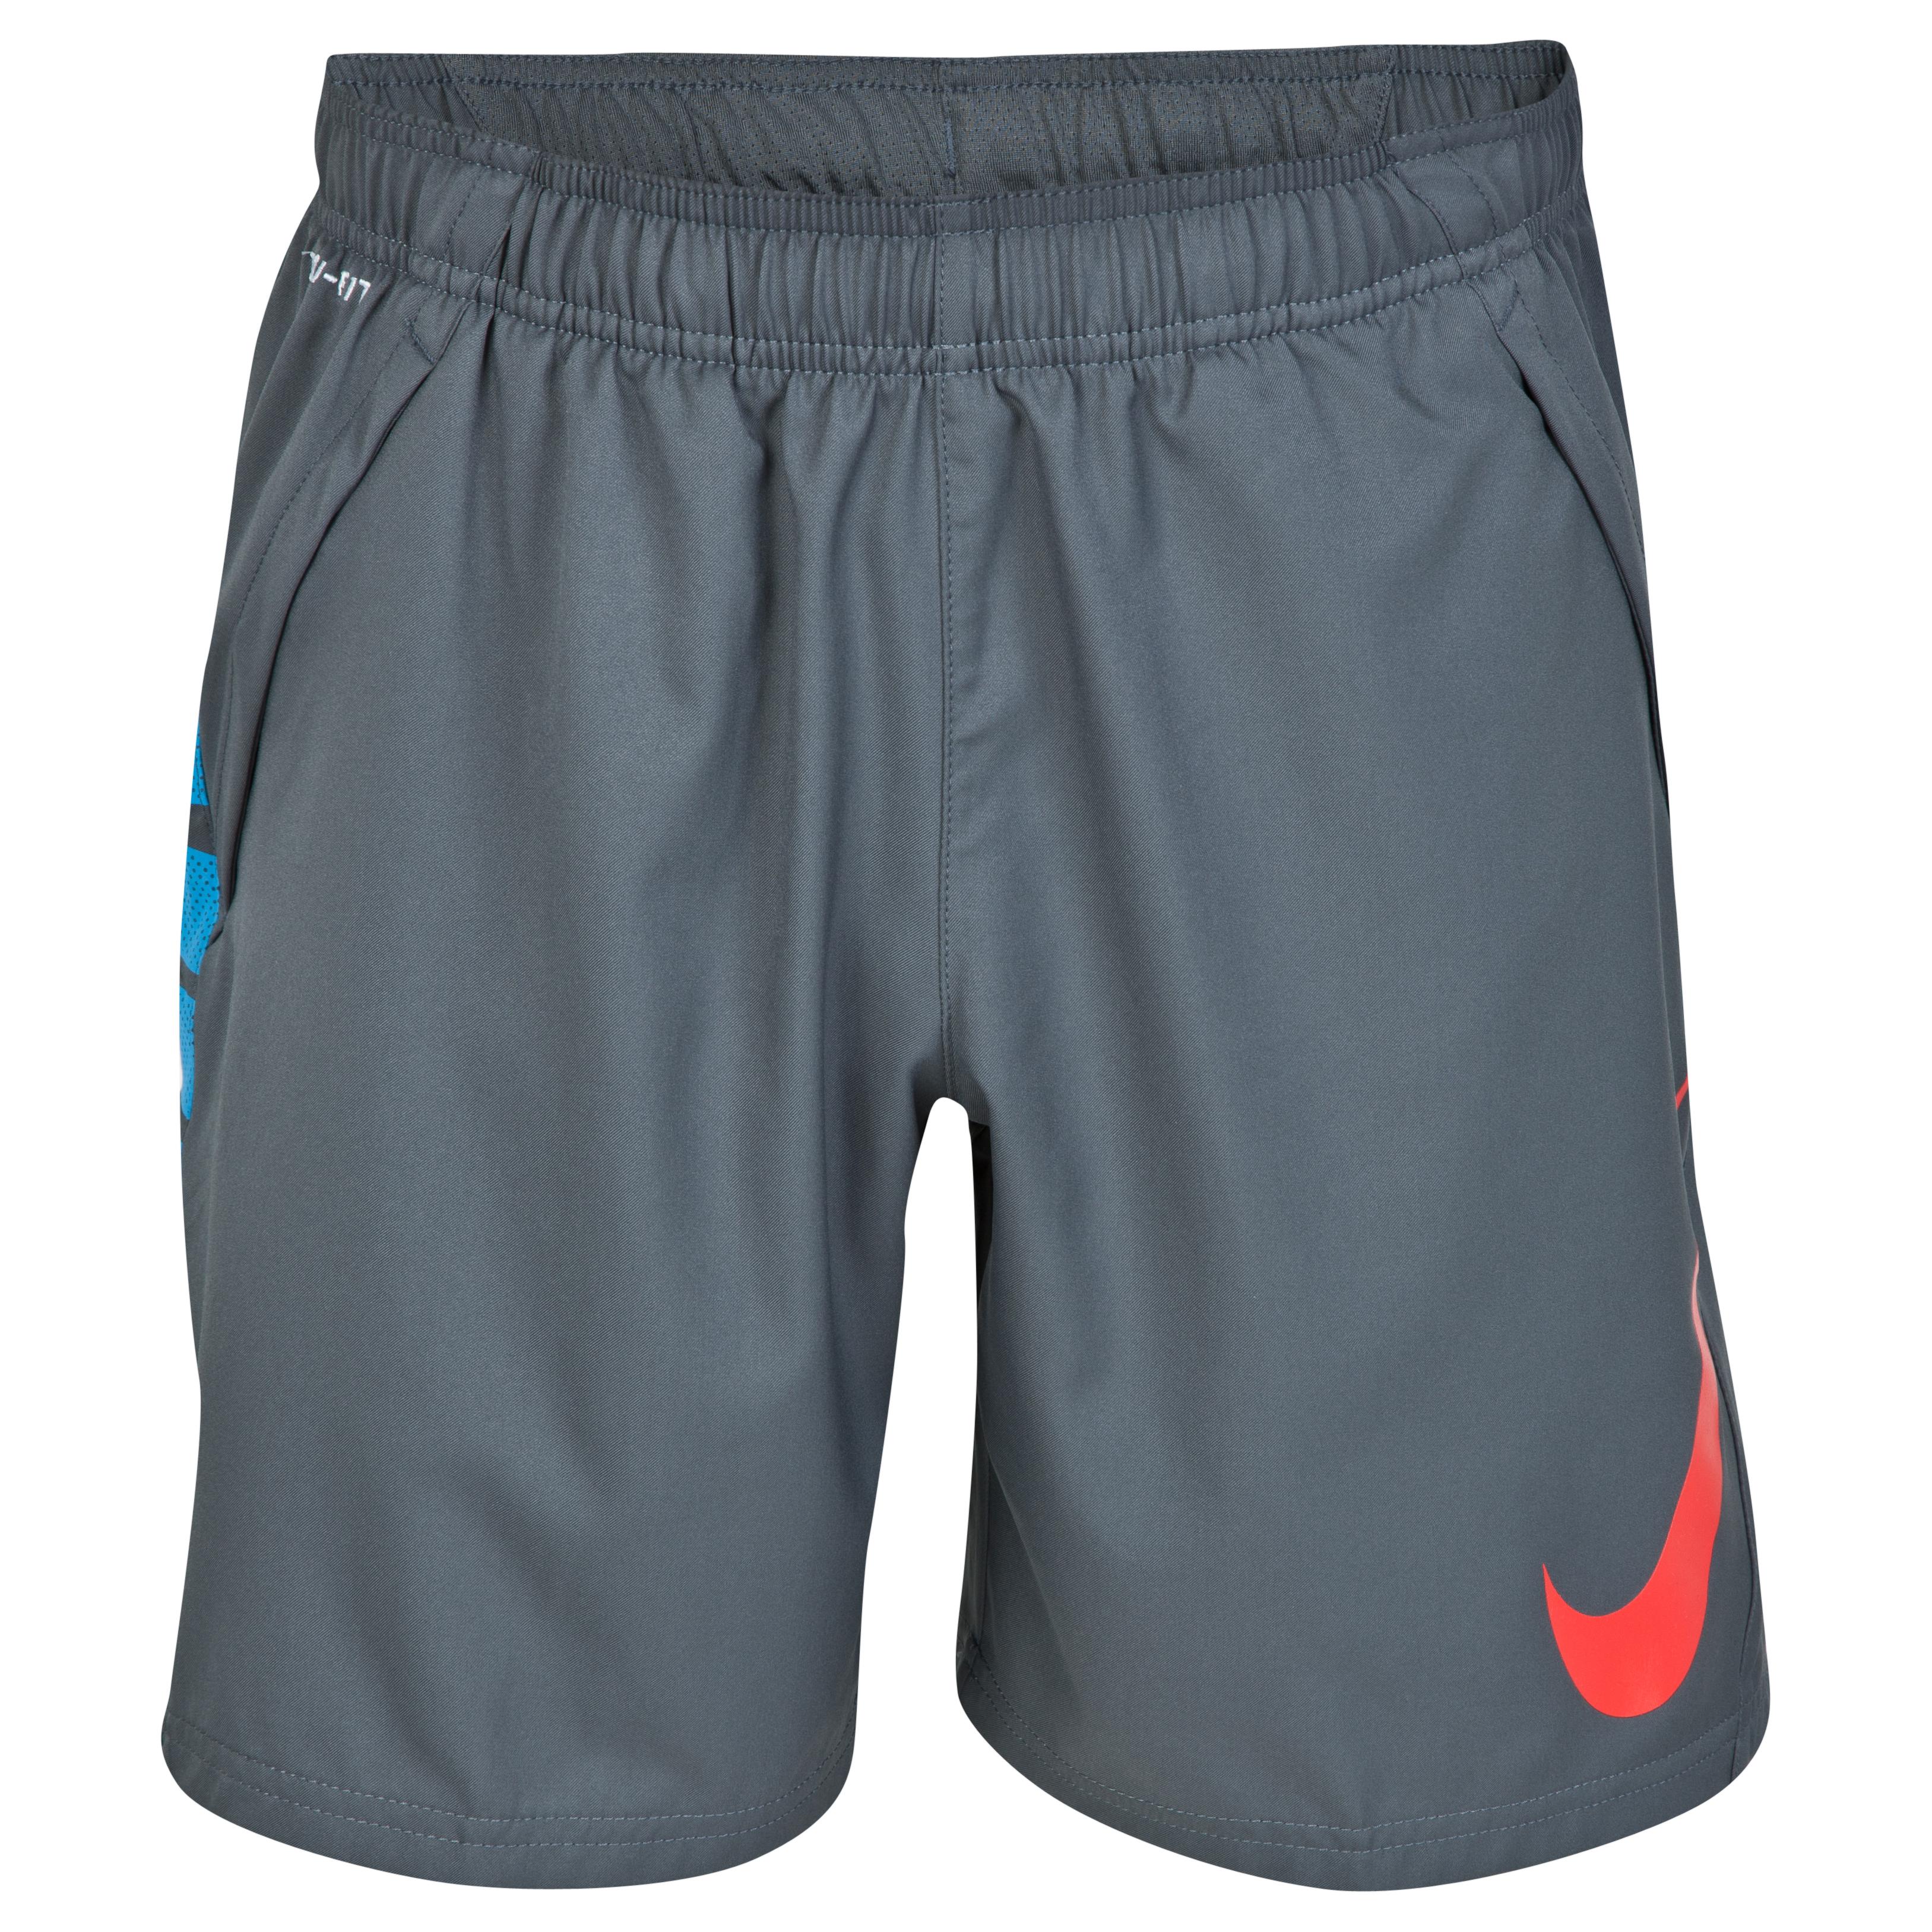 Nike Gpx Woven Training Short Dk Grey